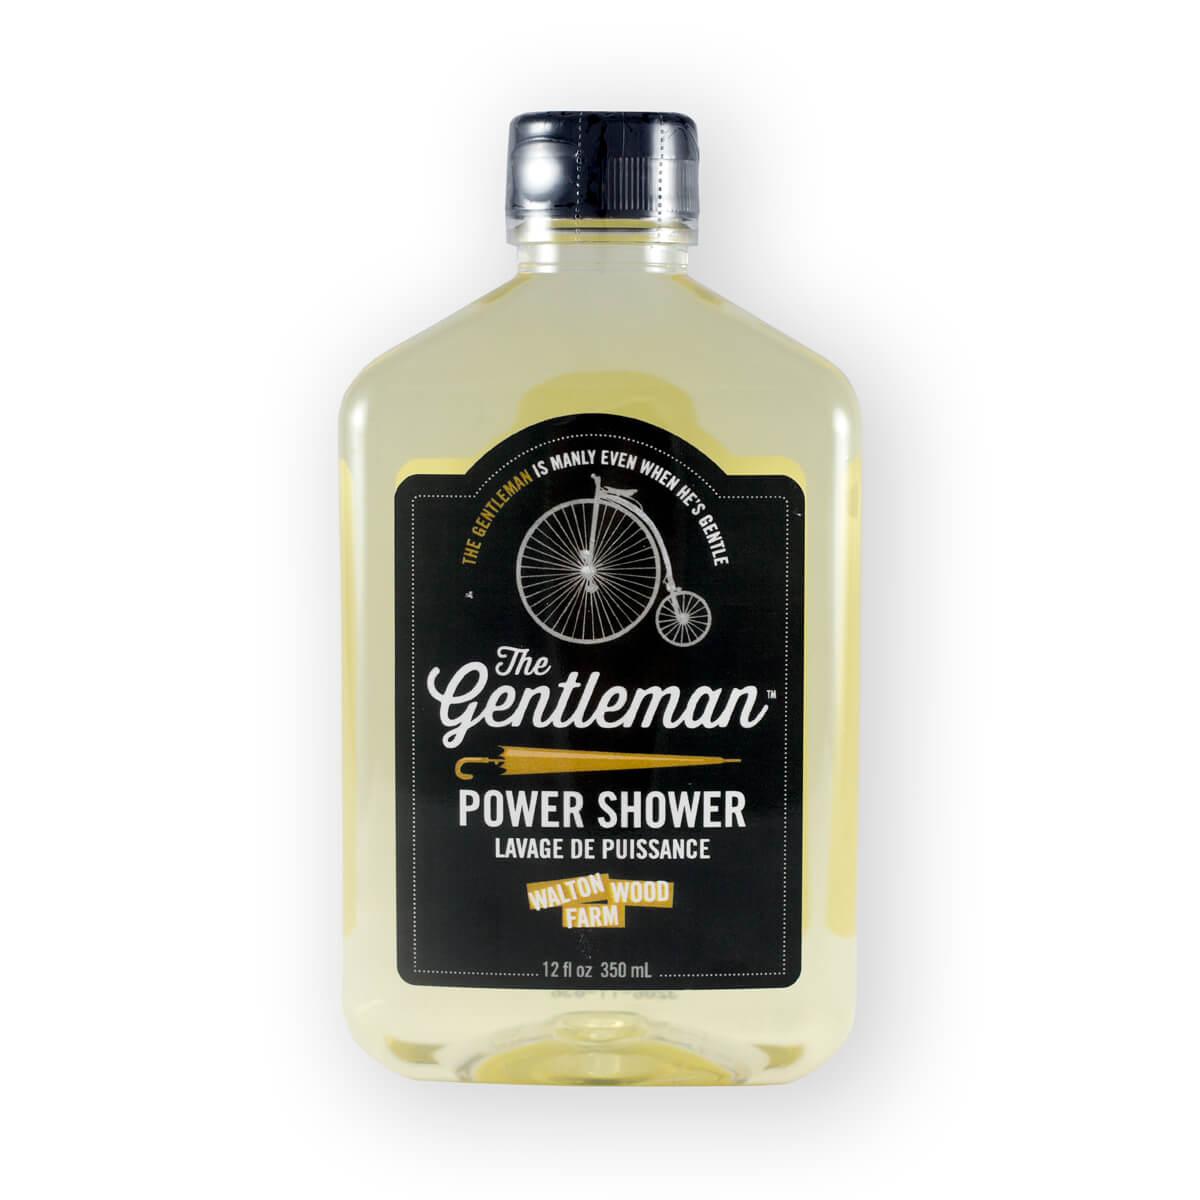 sequoia dowtown gift him father shower gel dye-free vegan eco-friendly walton wood farm moncton